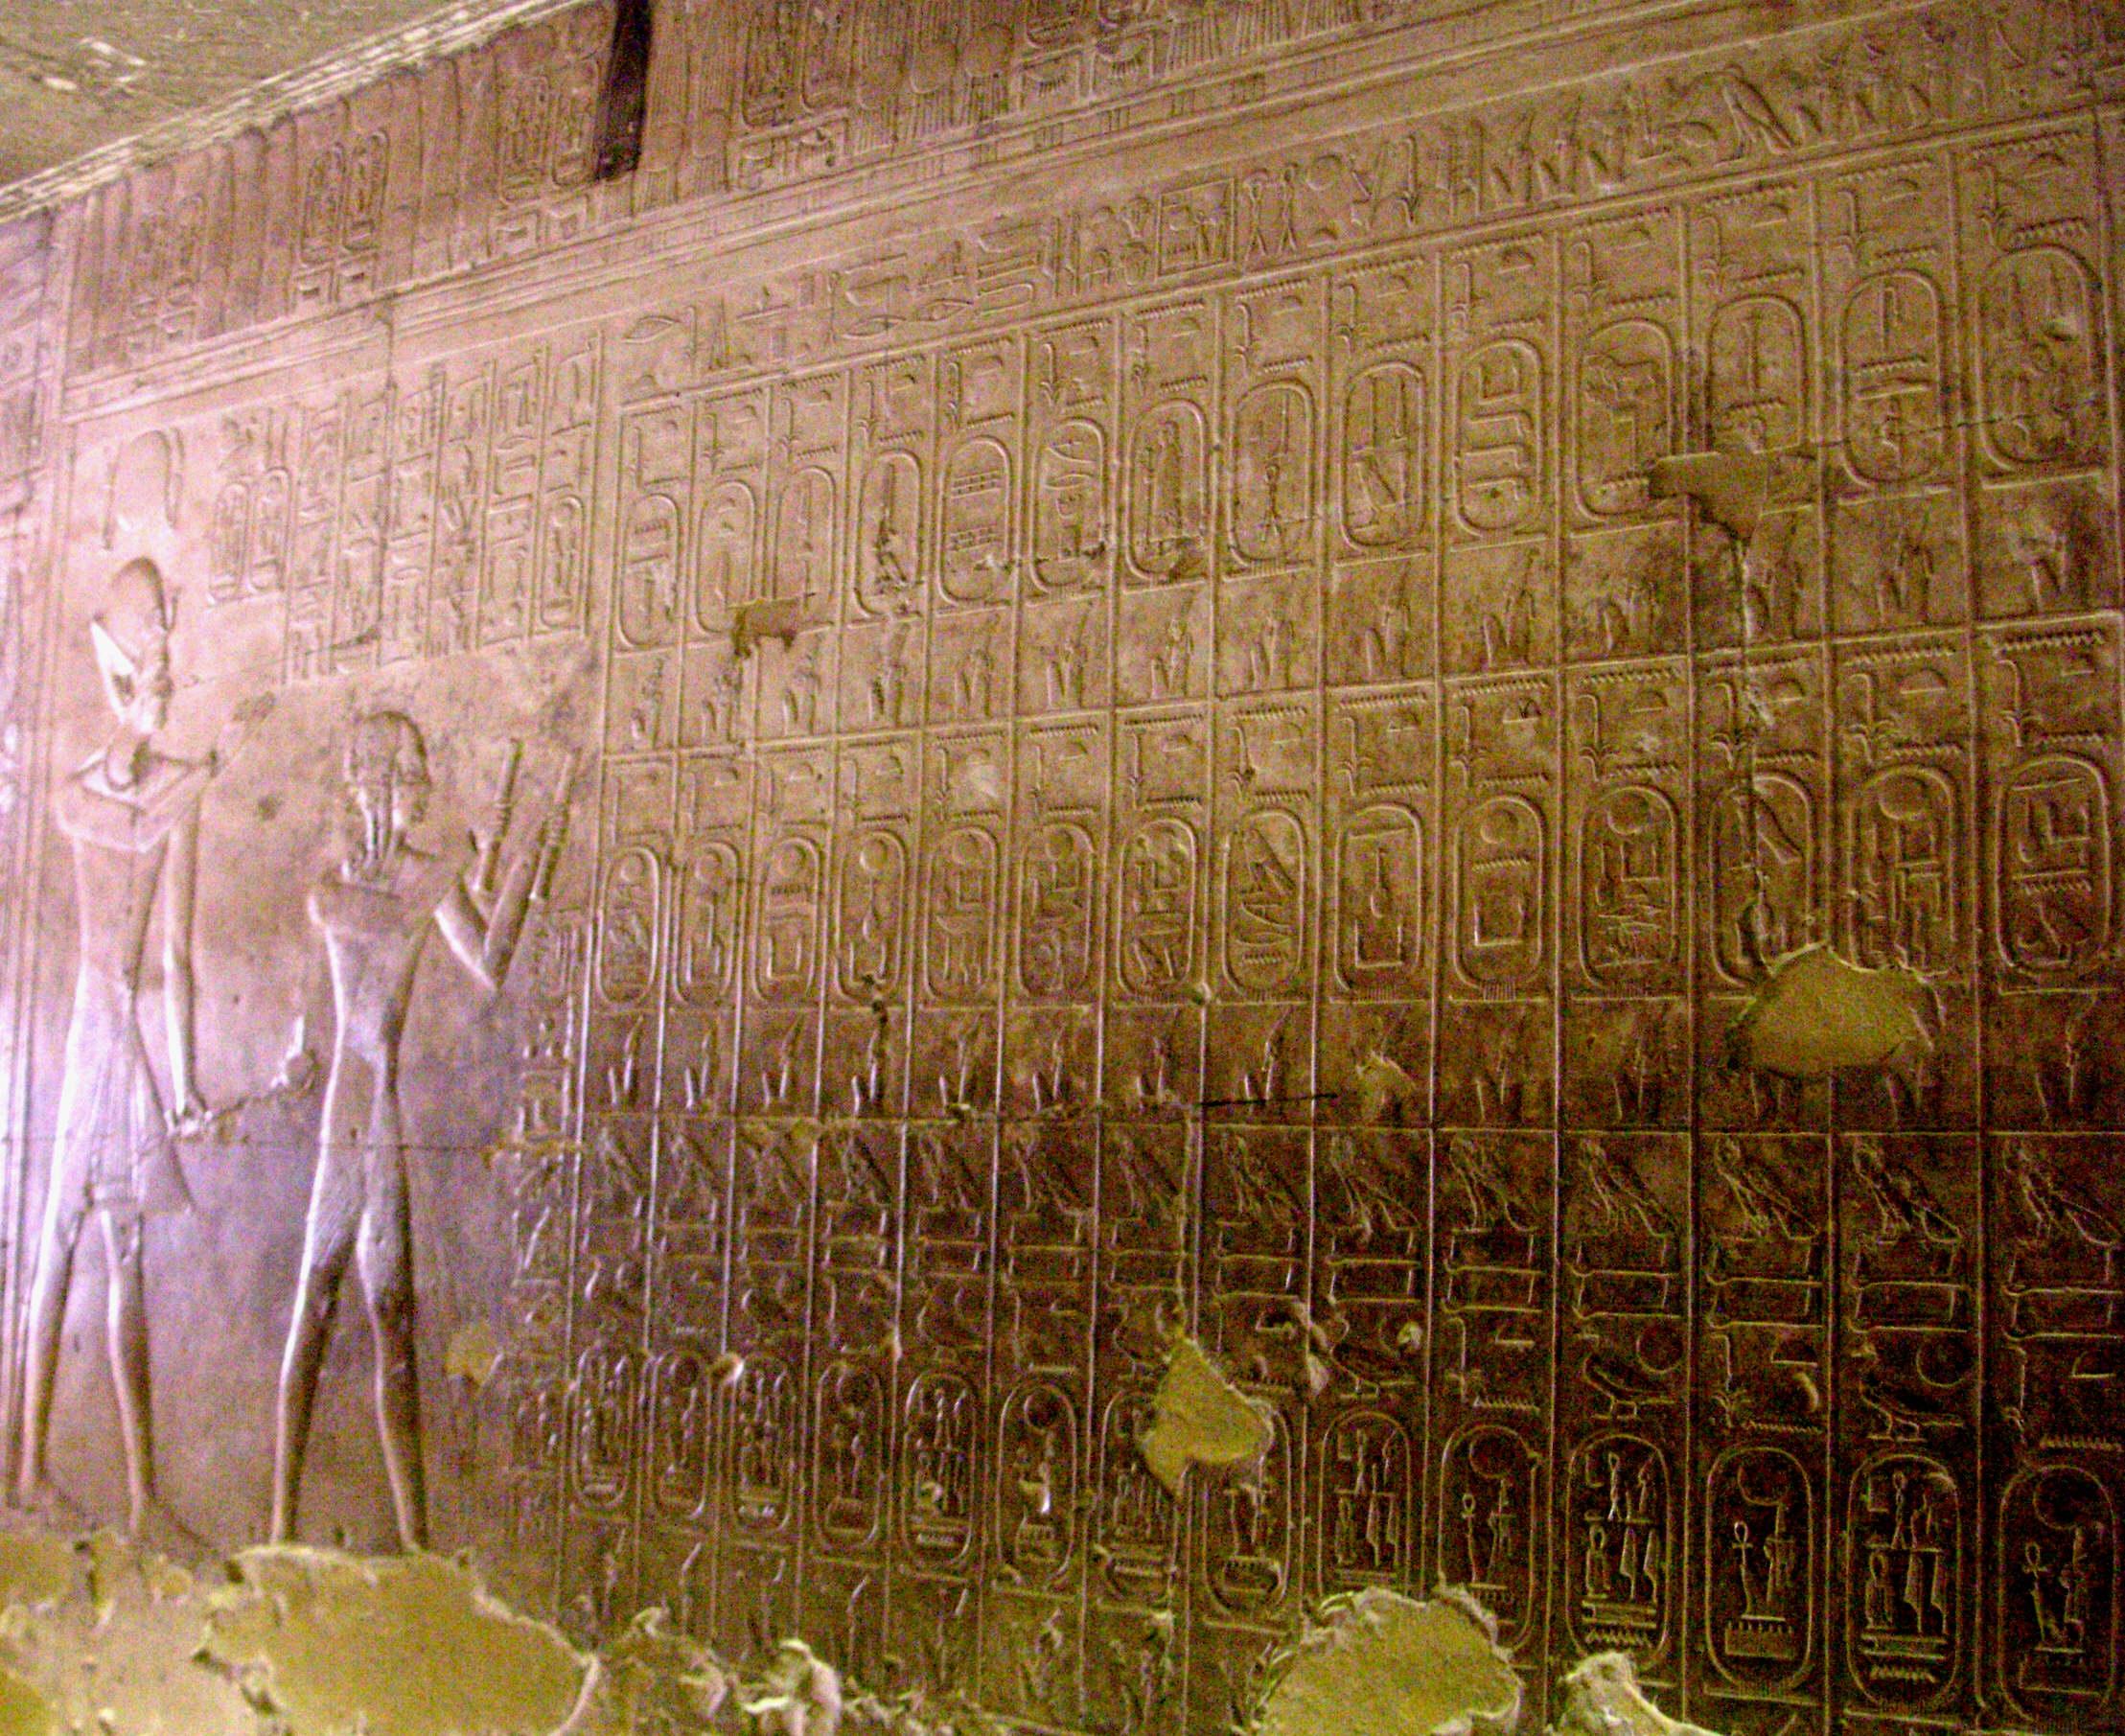 http://upload.wikimedia.org/wikipedia/commons/f/f2/Abydos_Koenigsliste_Sethos_Ramses.jpg